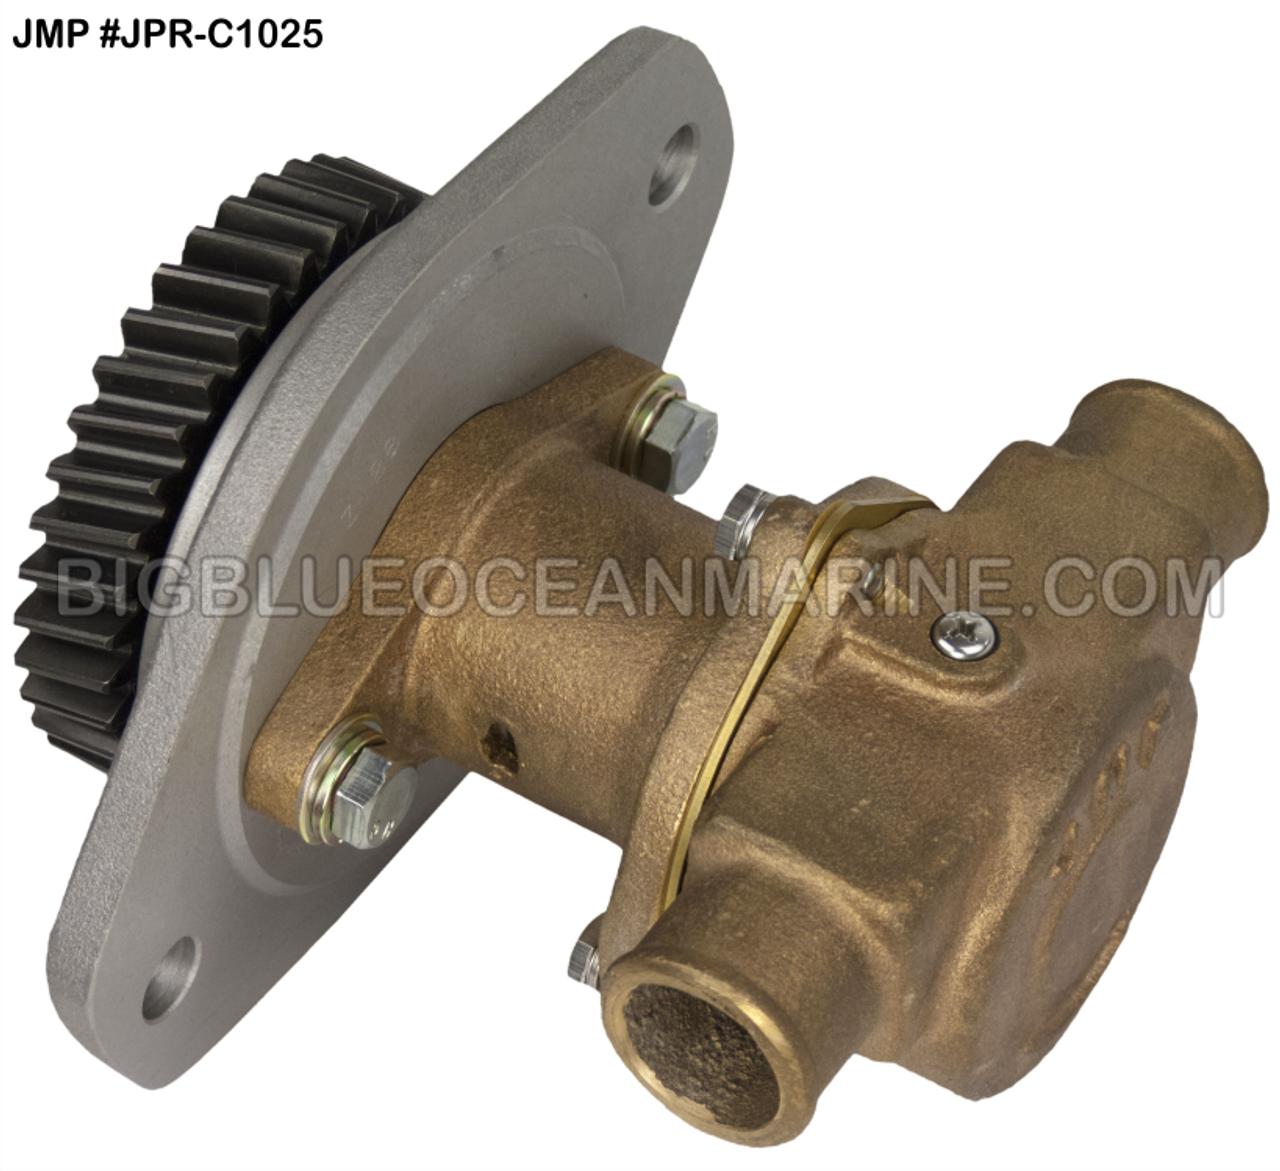 Engine heater kit for CUMMINS Marine Engines 6B5.9M 6BT5.9M